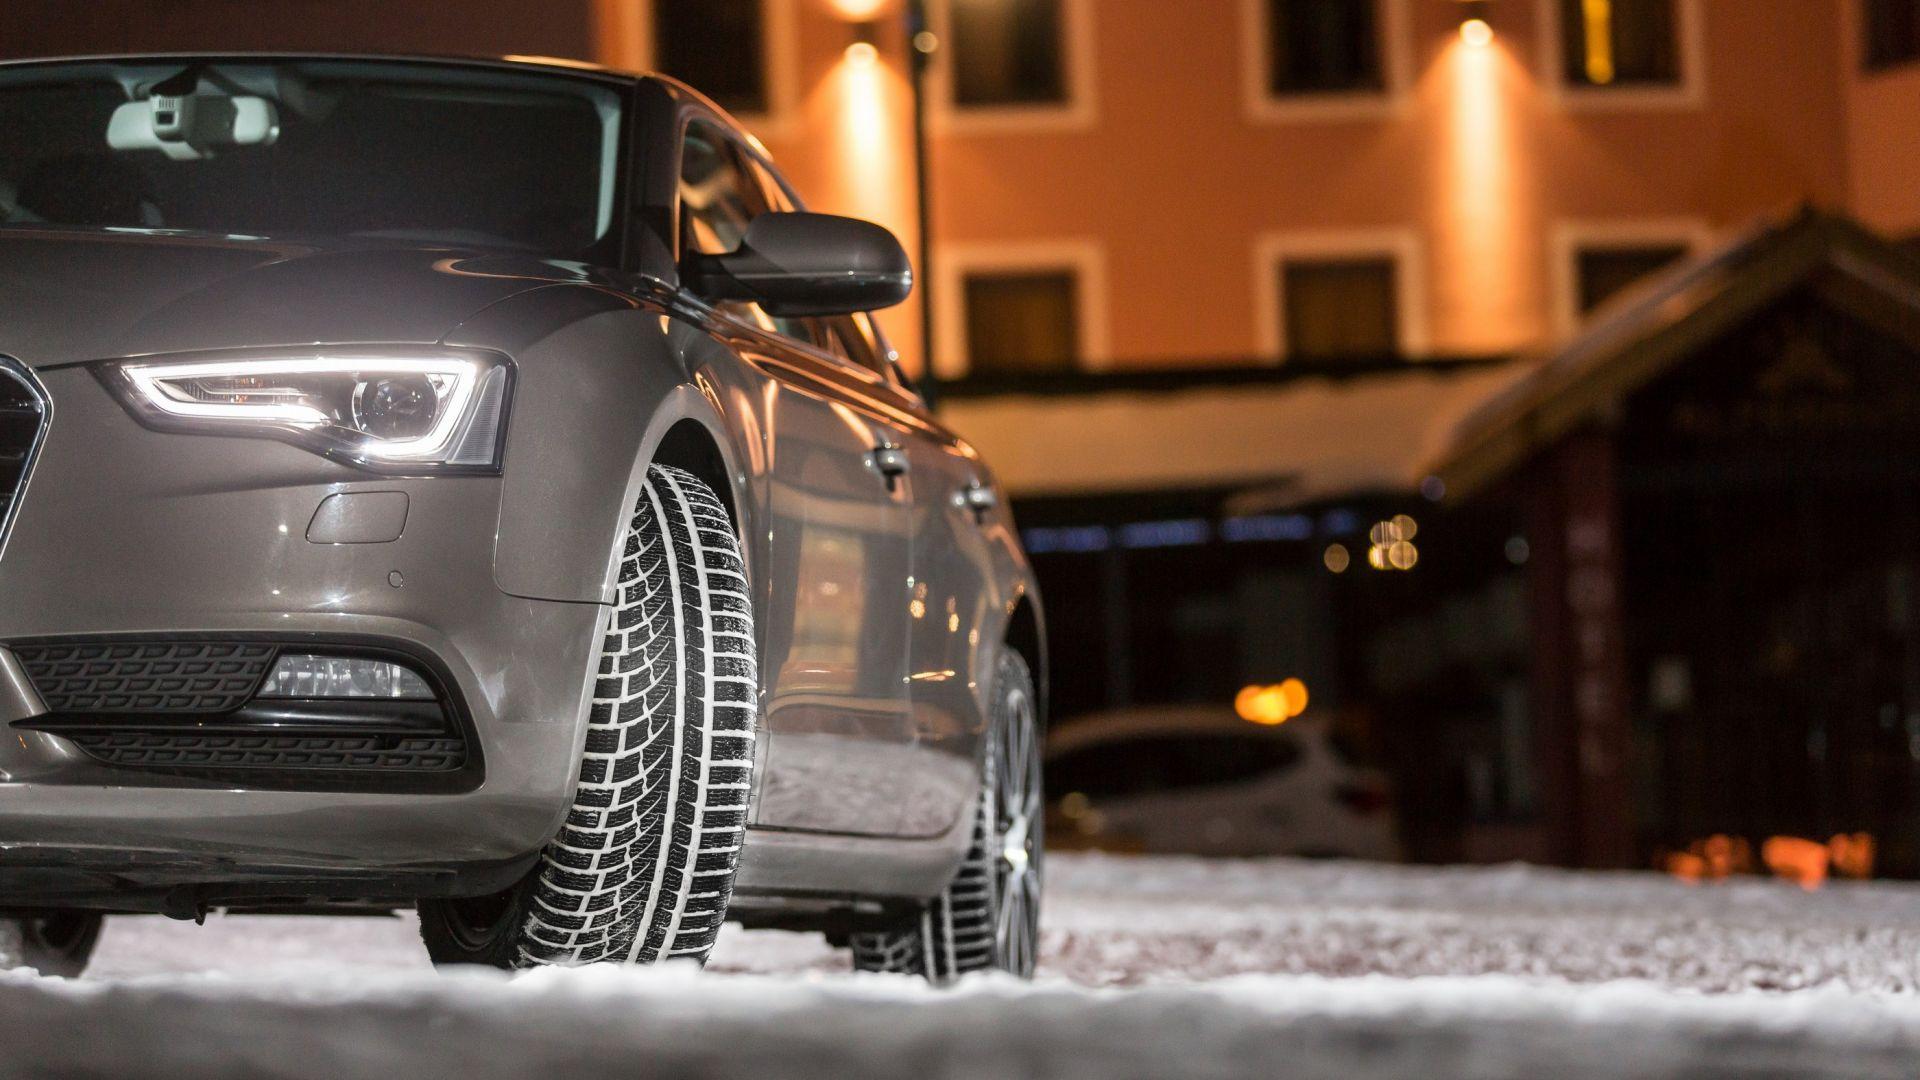 Tyres nokian tre novit per l 39 inverno 2016 motorbox for Tre box auto